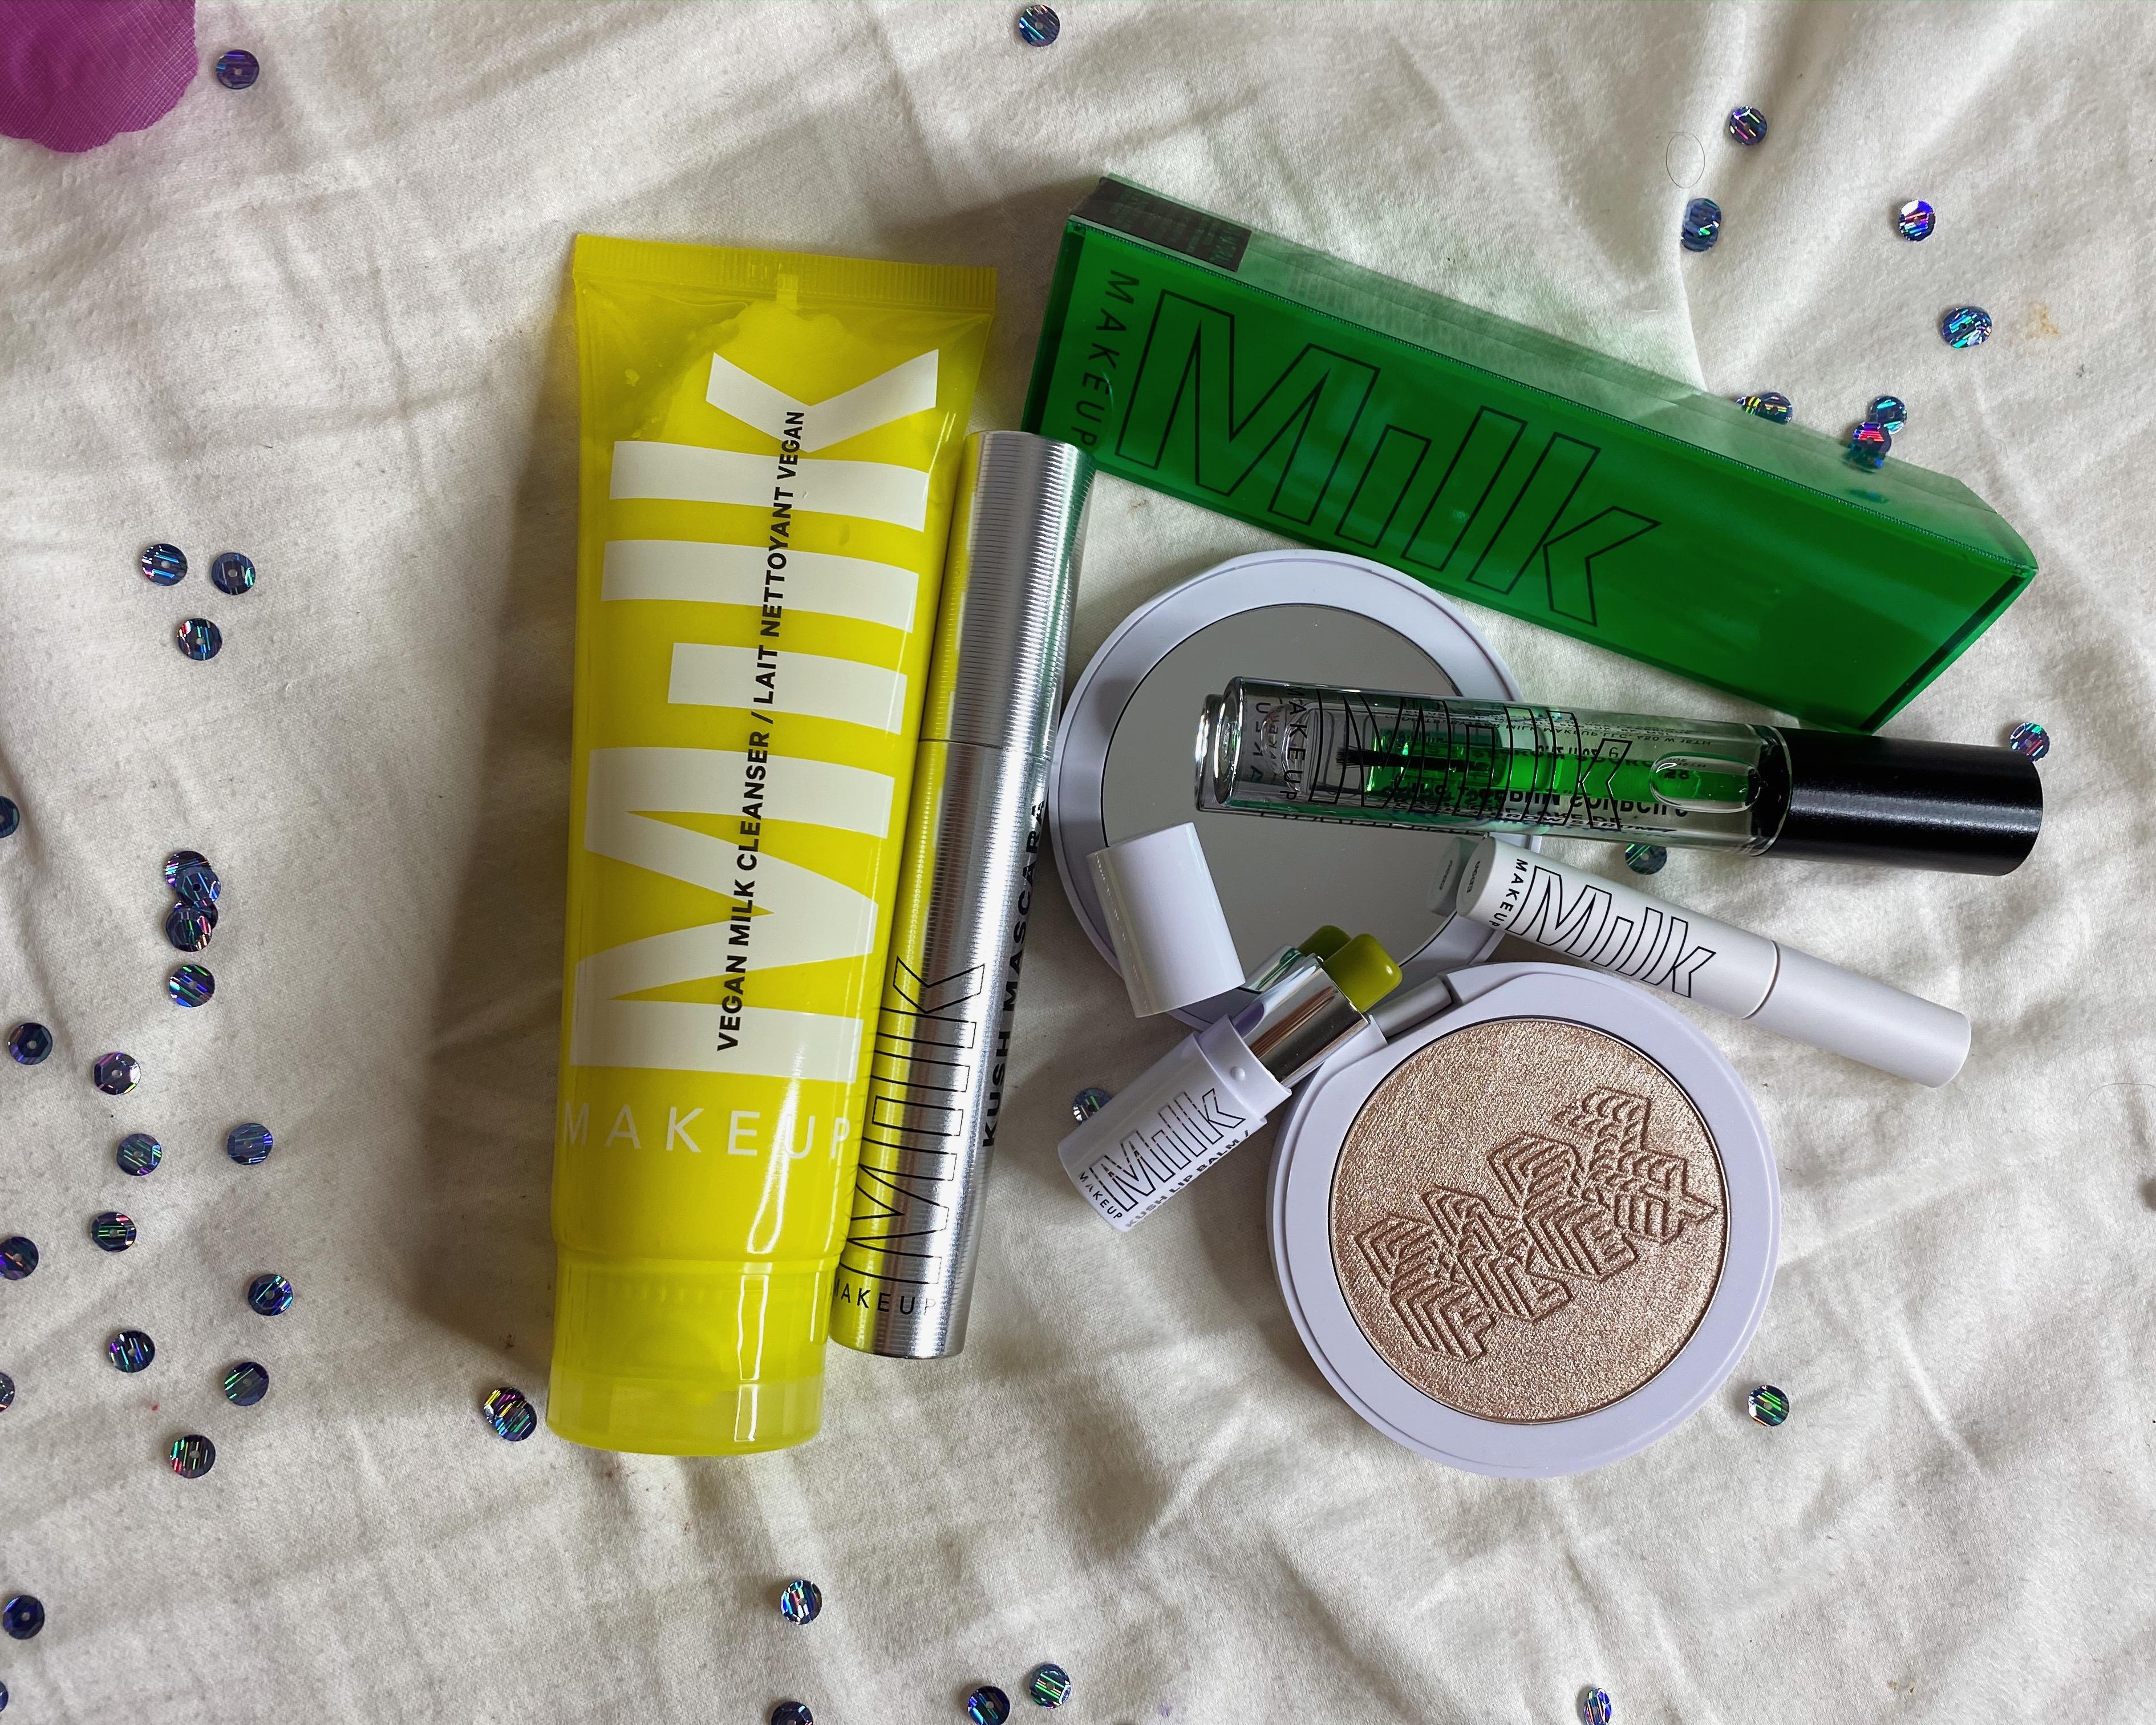 2020 Beauty Low Buy Update #3 | Milk Makeup Vegan Milk Cleanser | Milk Makeup Flex Highlighter Lit | Milk Makeup KUSH | Milk Makeup Lash Serum